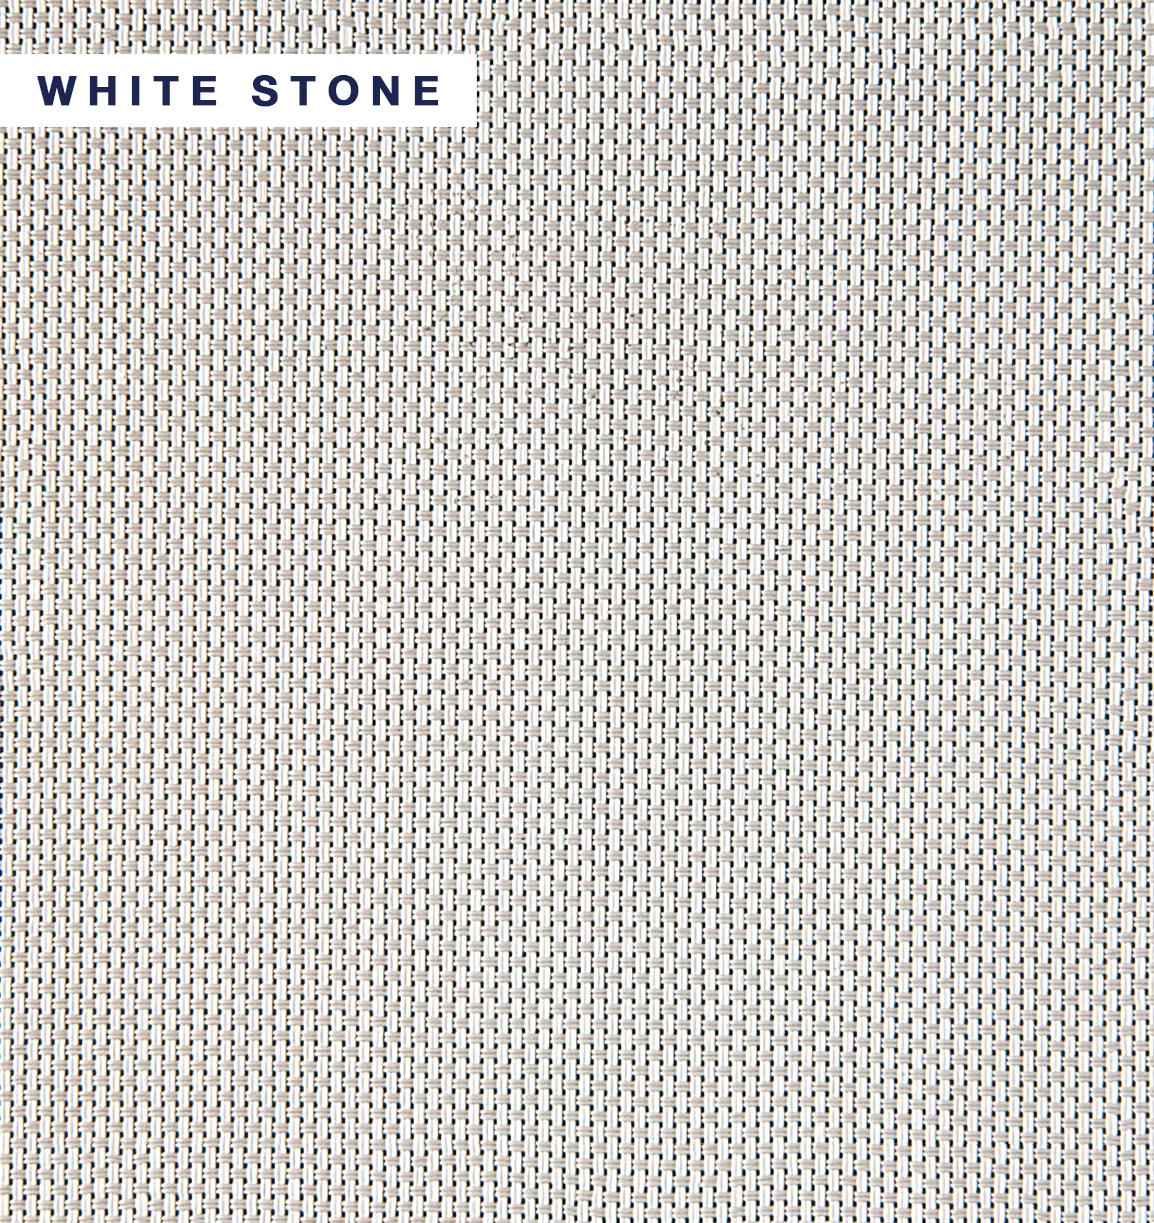 SW4510 - White Stone.jpg